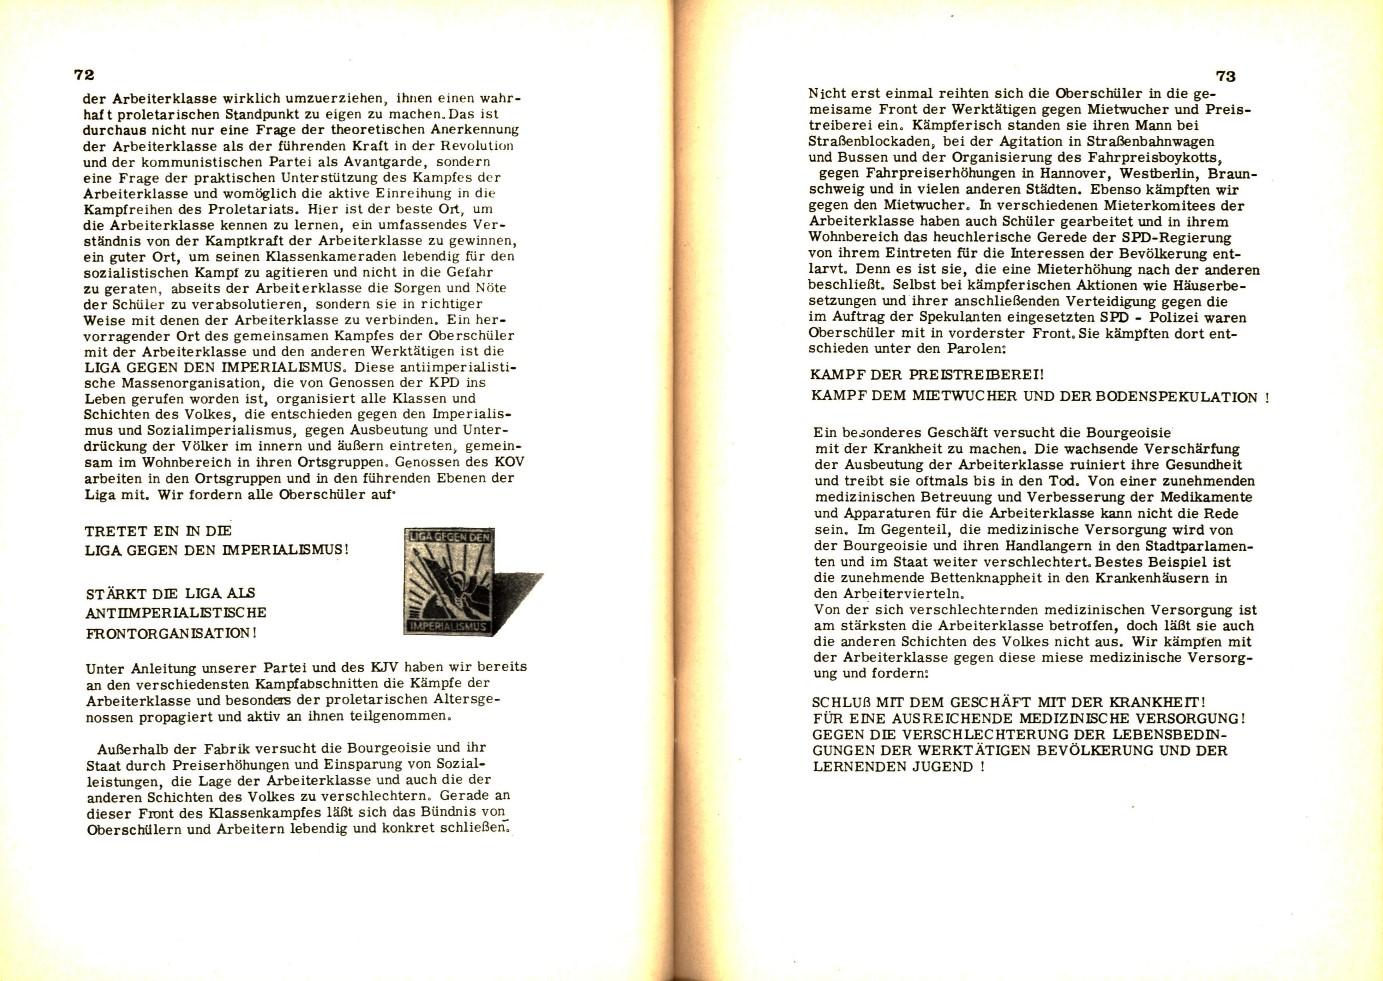 KOV_1973_Aktionsprogramm_39